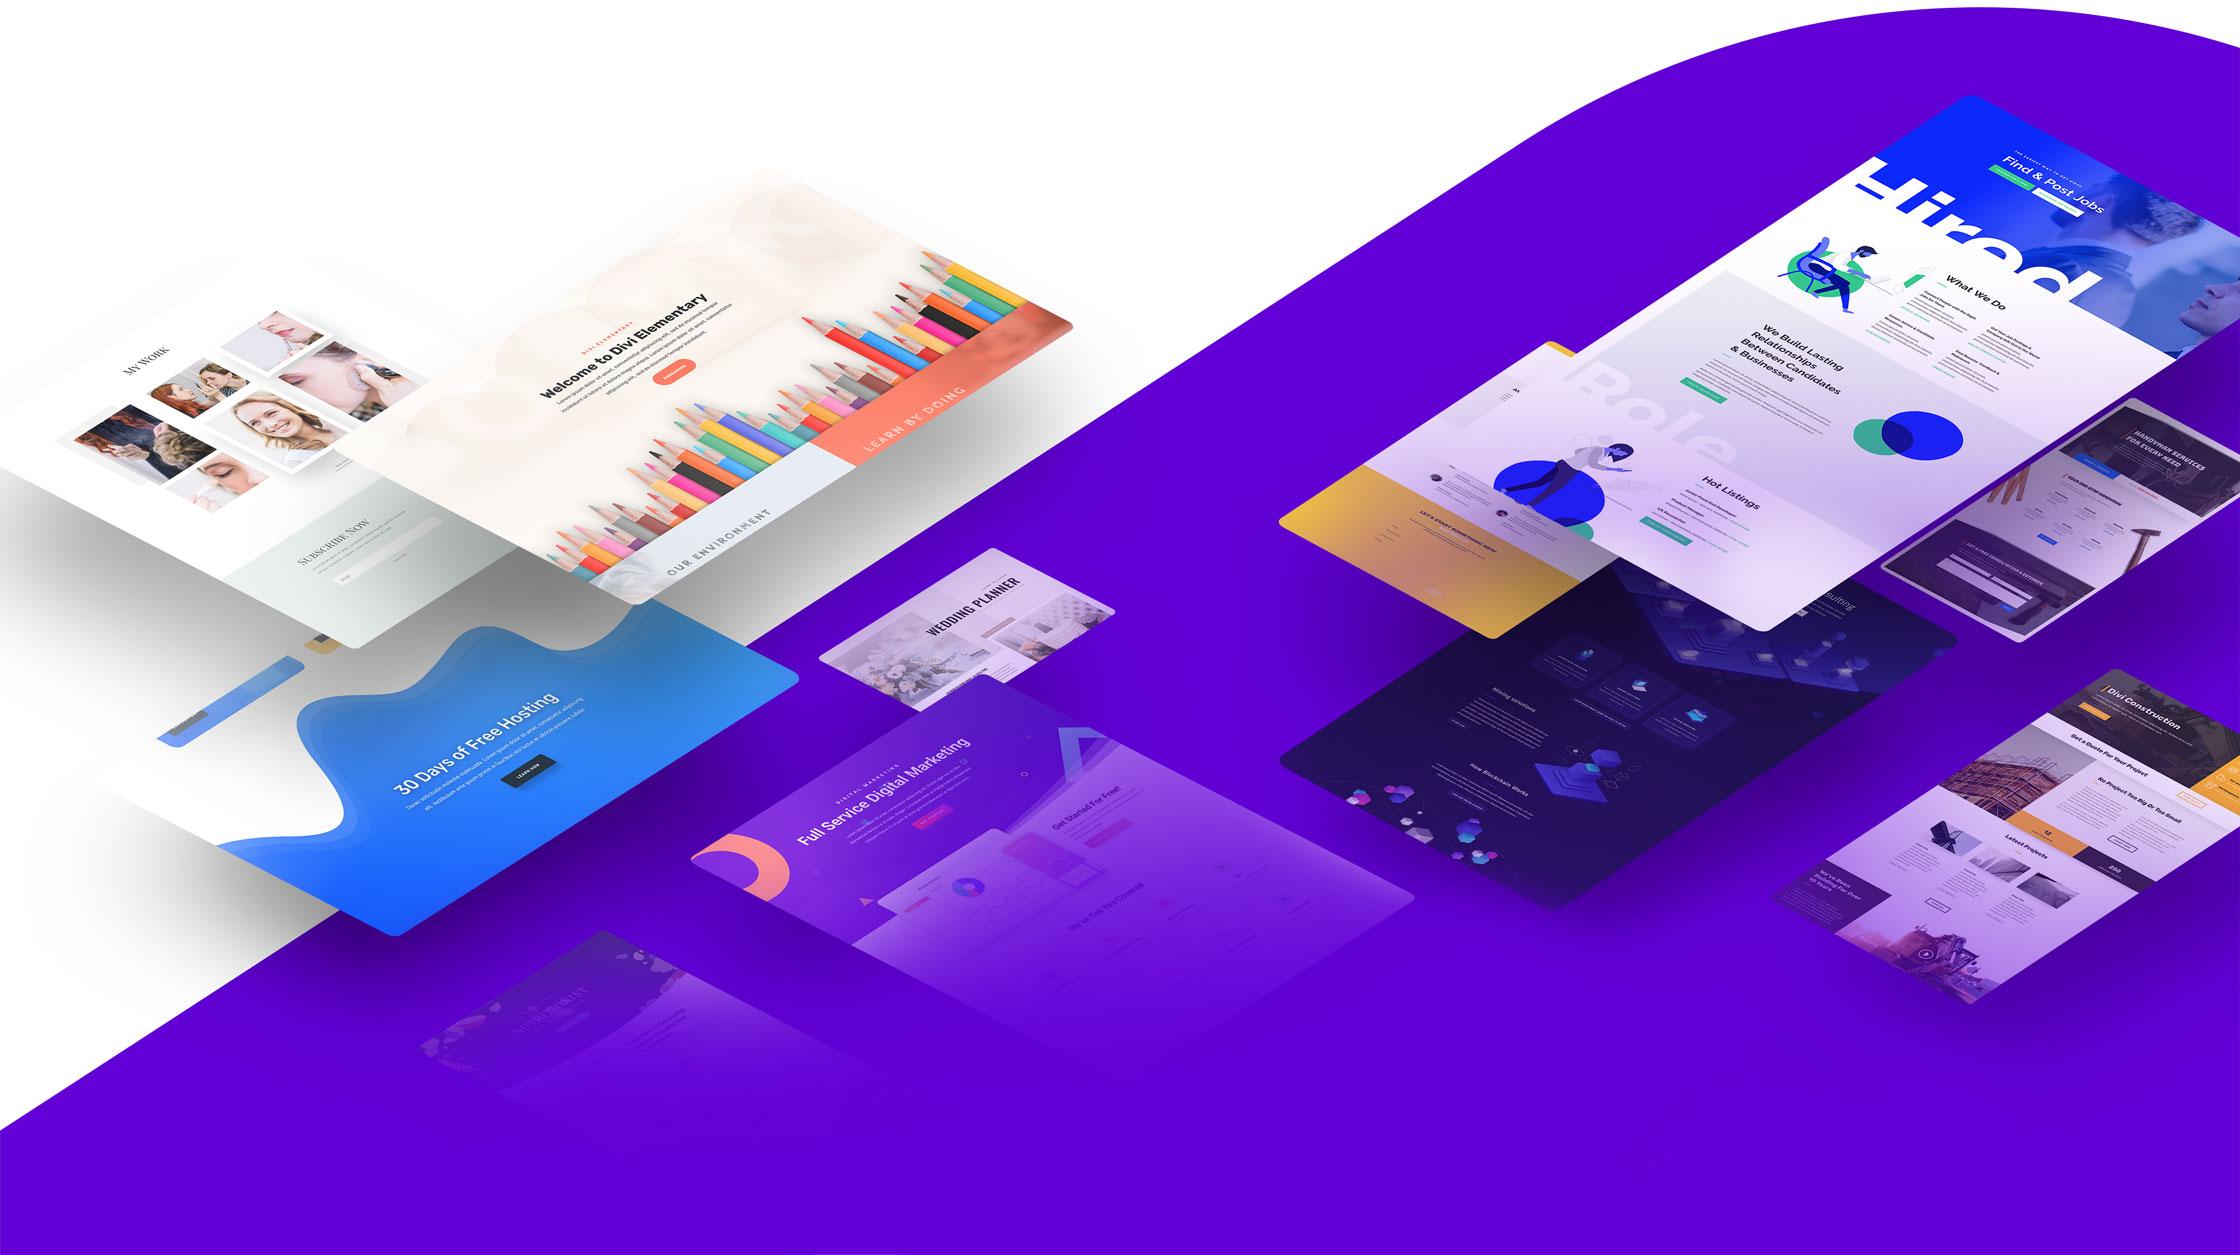 Banner image for WordPress page builder plugin Divi